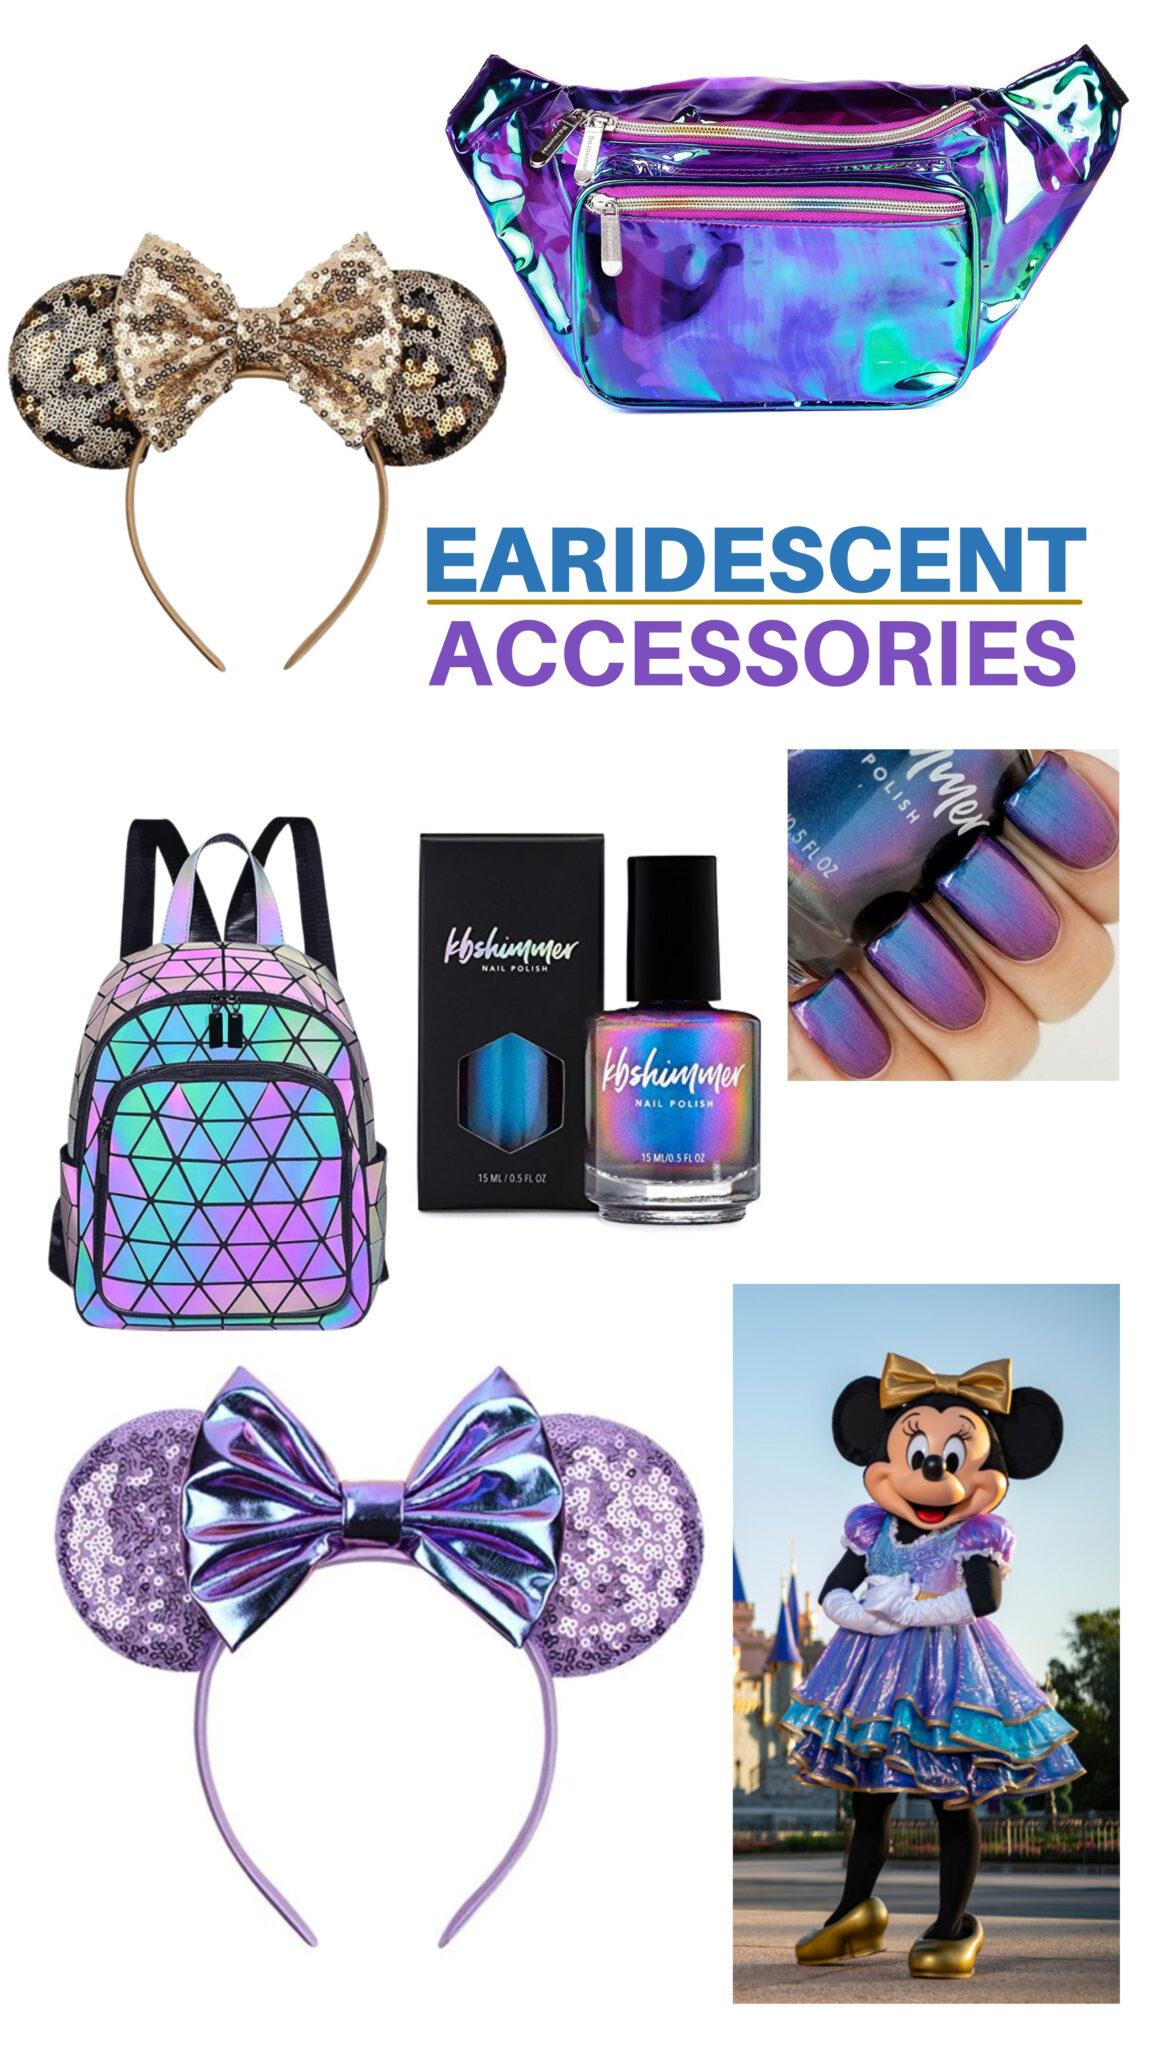 Walt Disney World 50th Anniversary Earidescent Themed Attire Found on Amazon All Things with Purpose Sarah Lemp 8